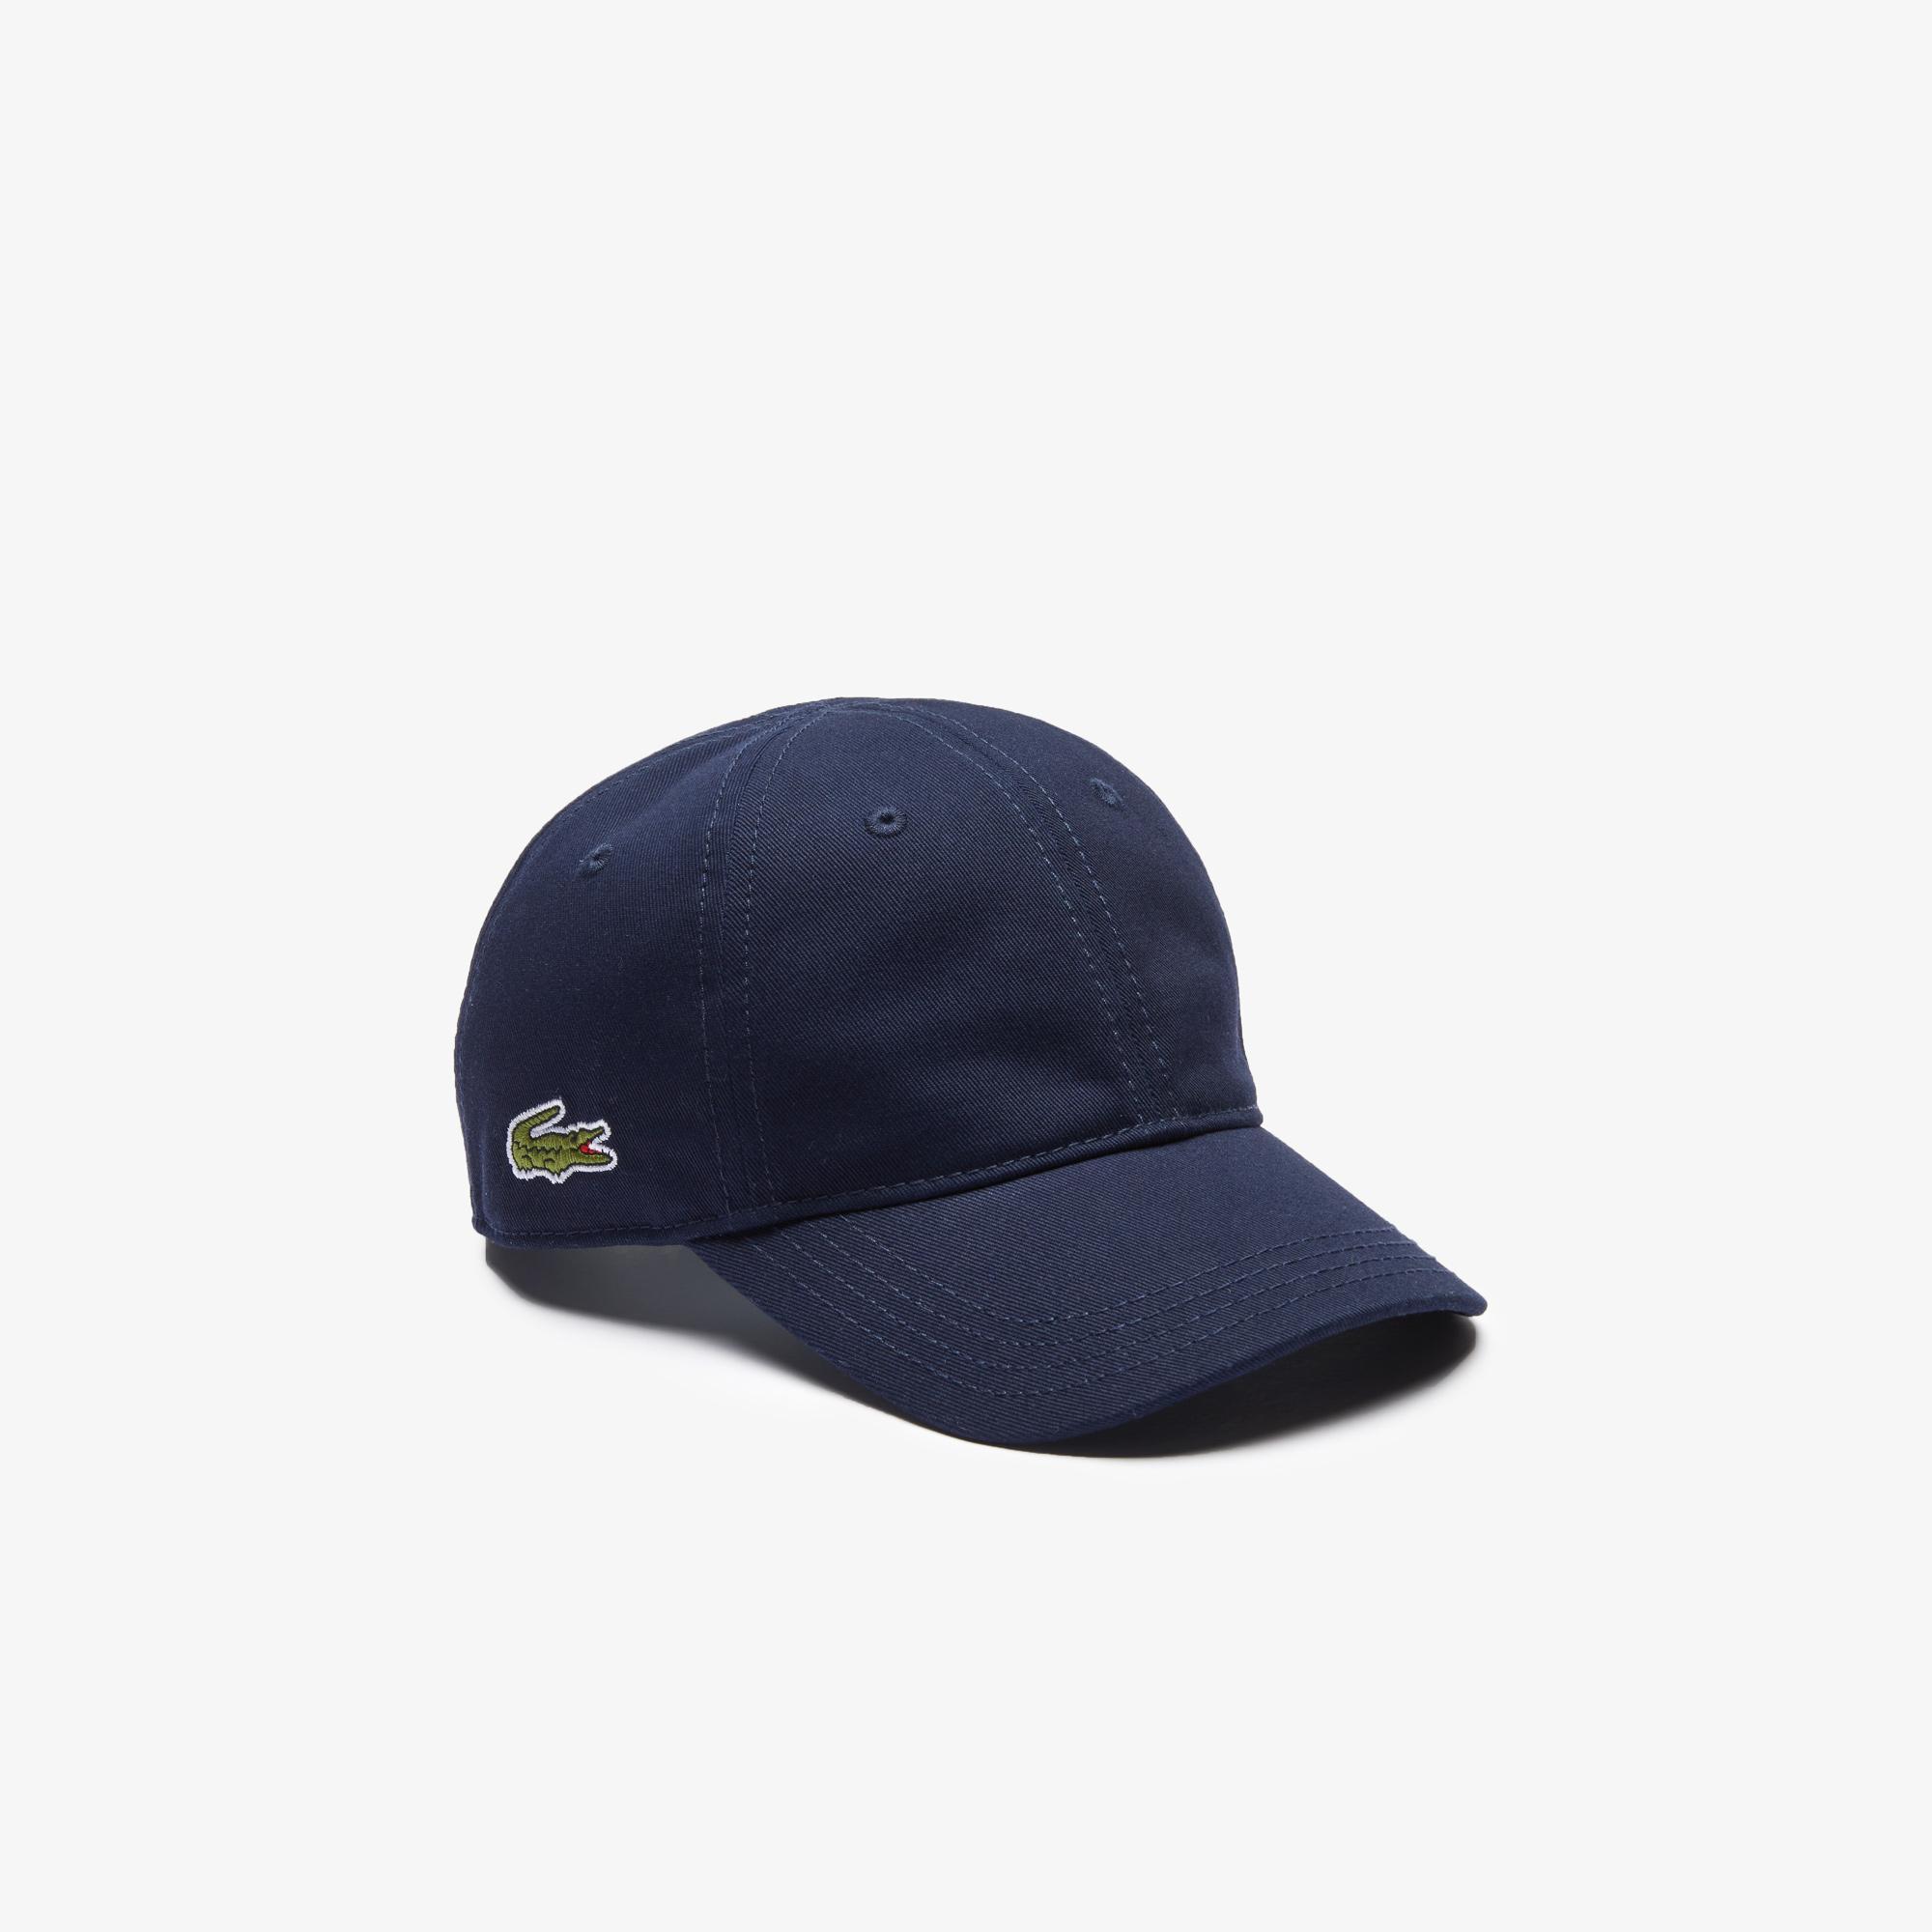 Lacoste Çocuk Lacivert Şapka